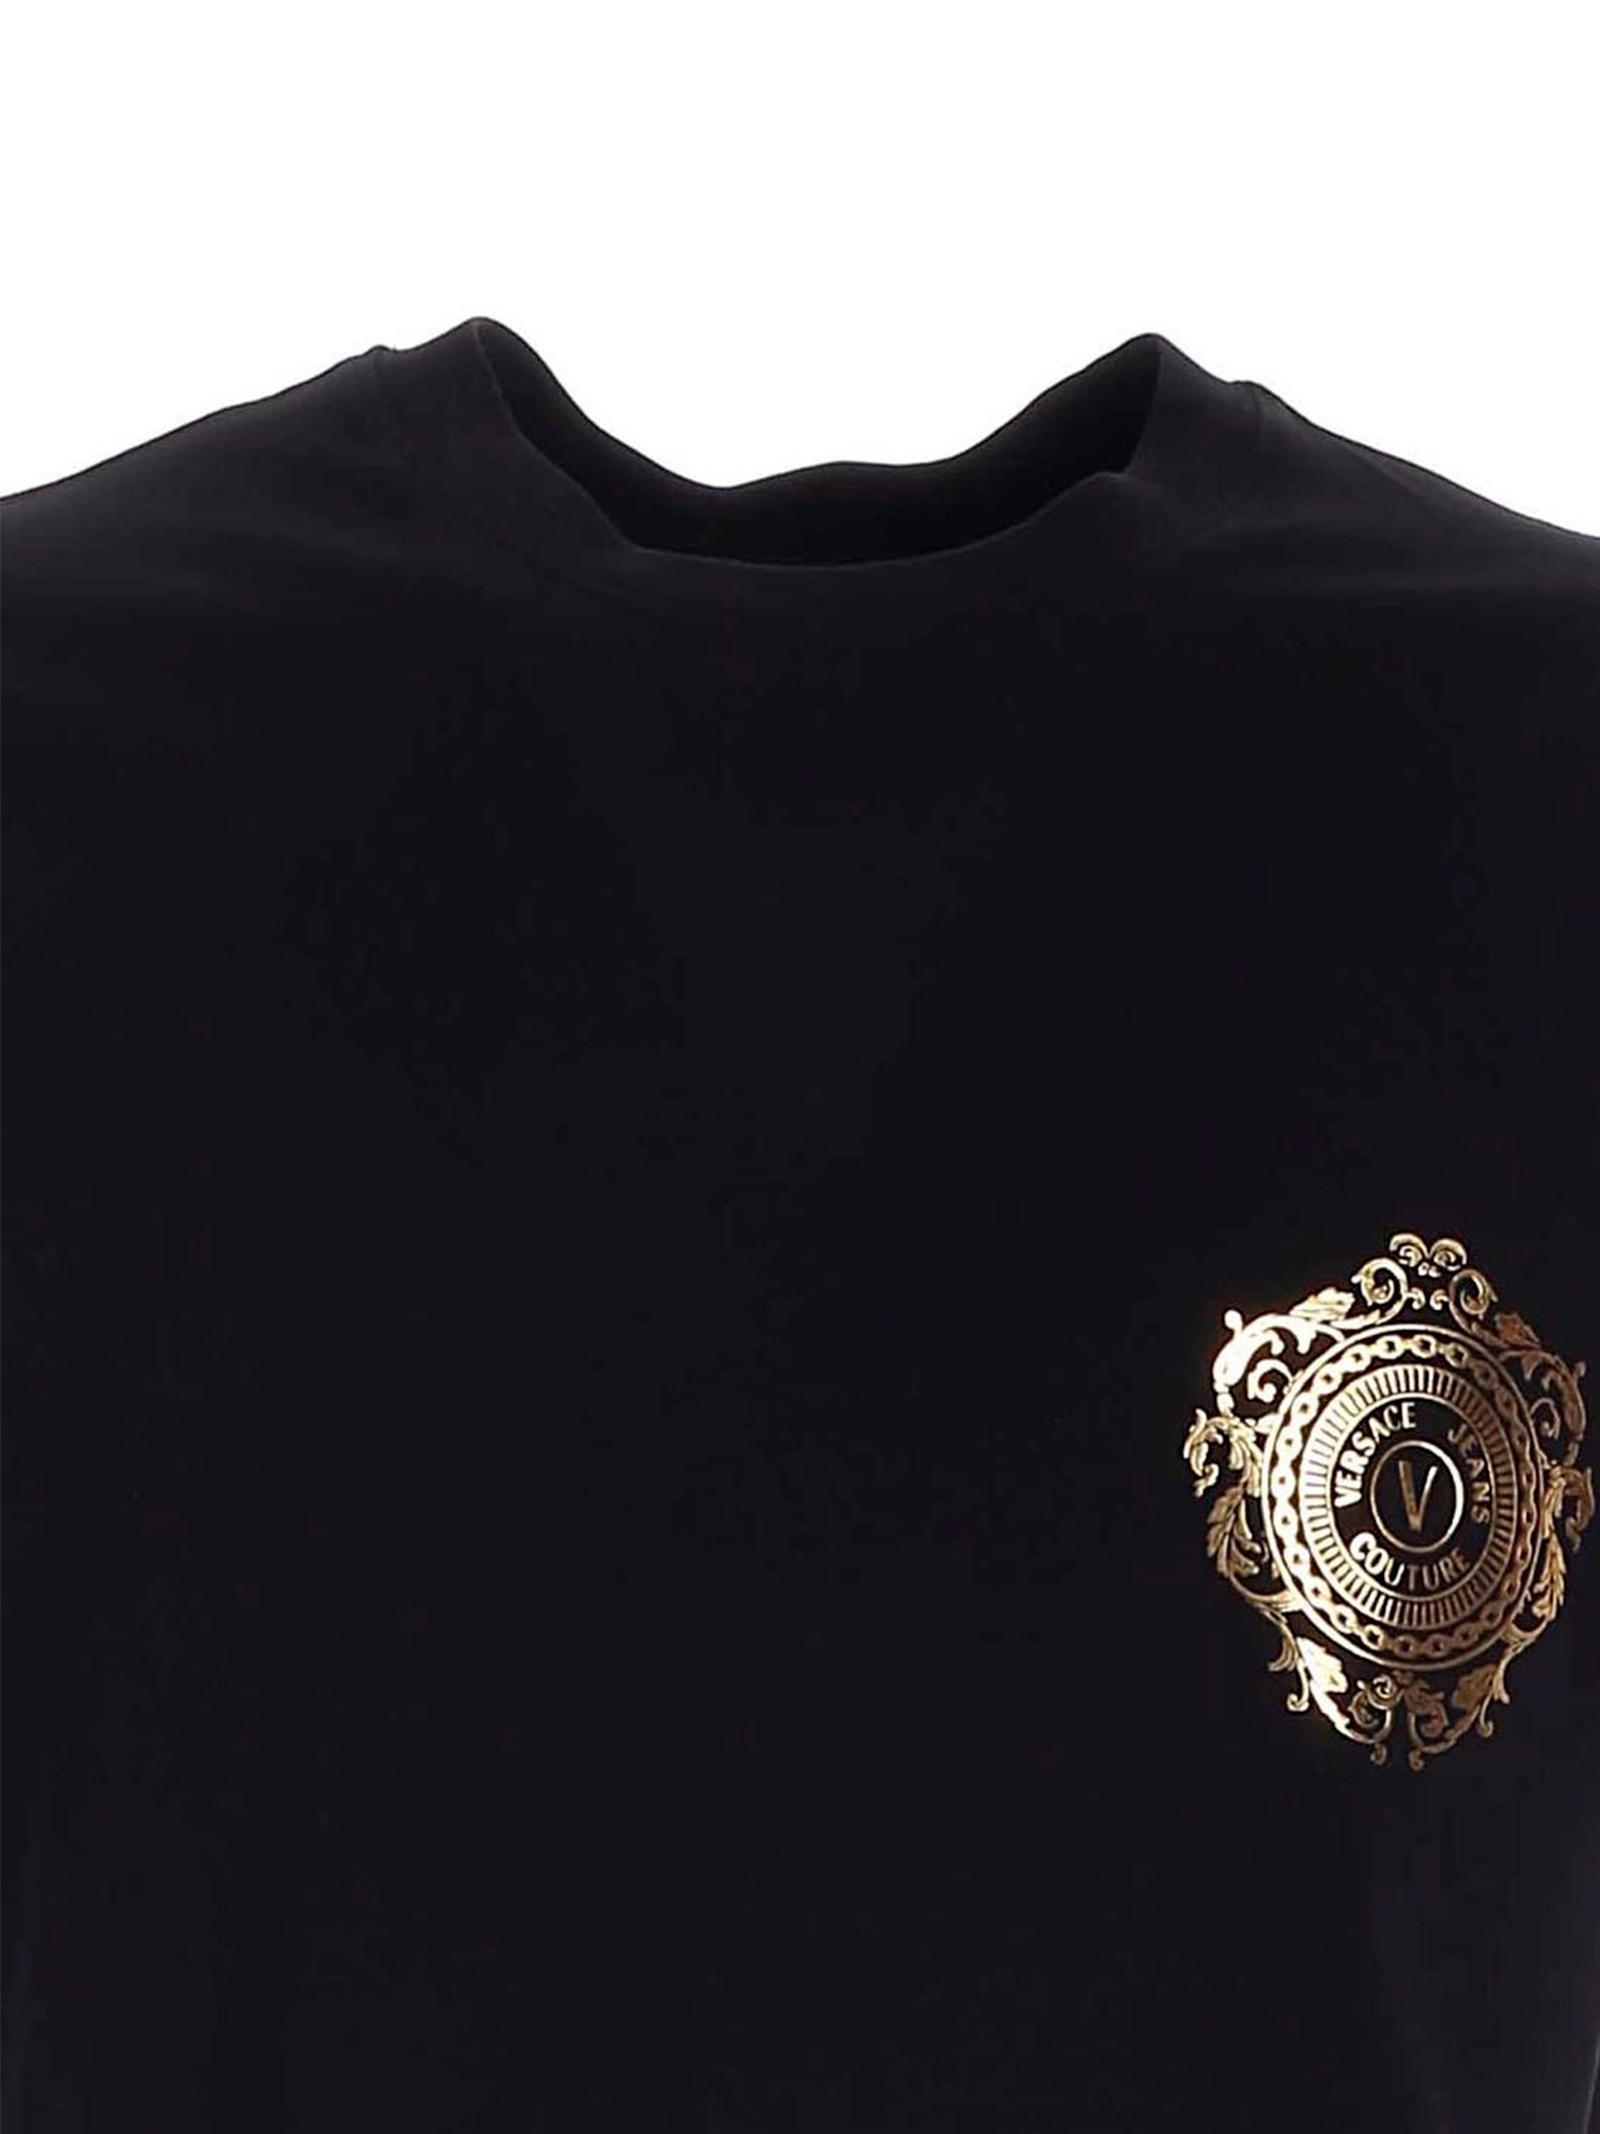 T-shirt Maniche Corte VERSACE JEANS | T-shirt | B3 GWA71F30454 K42